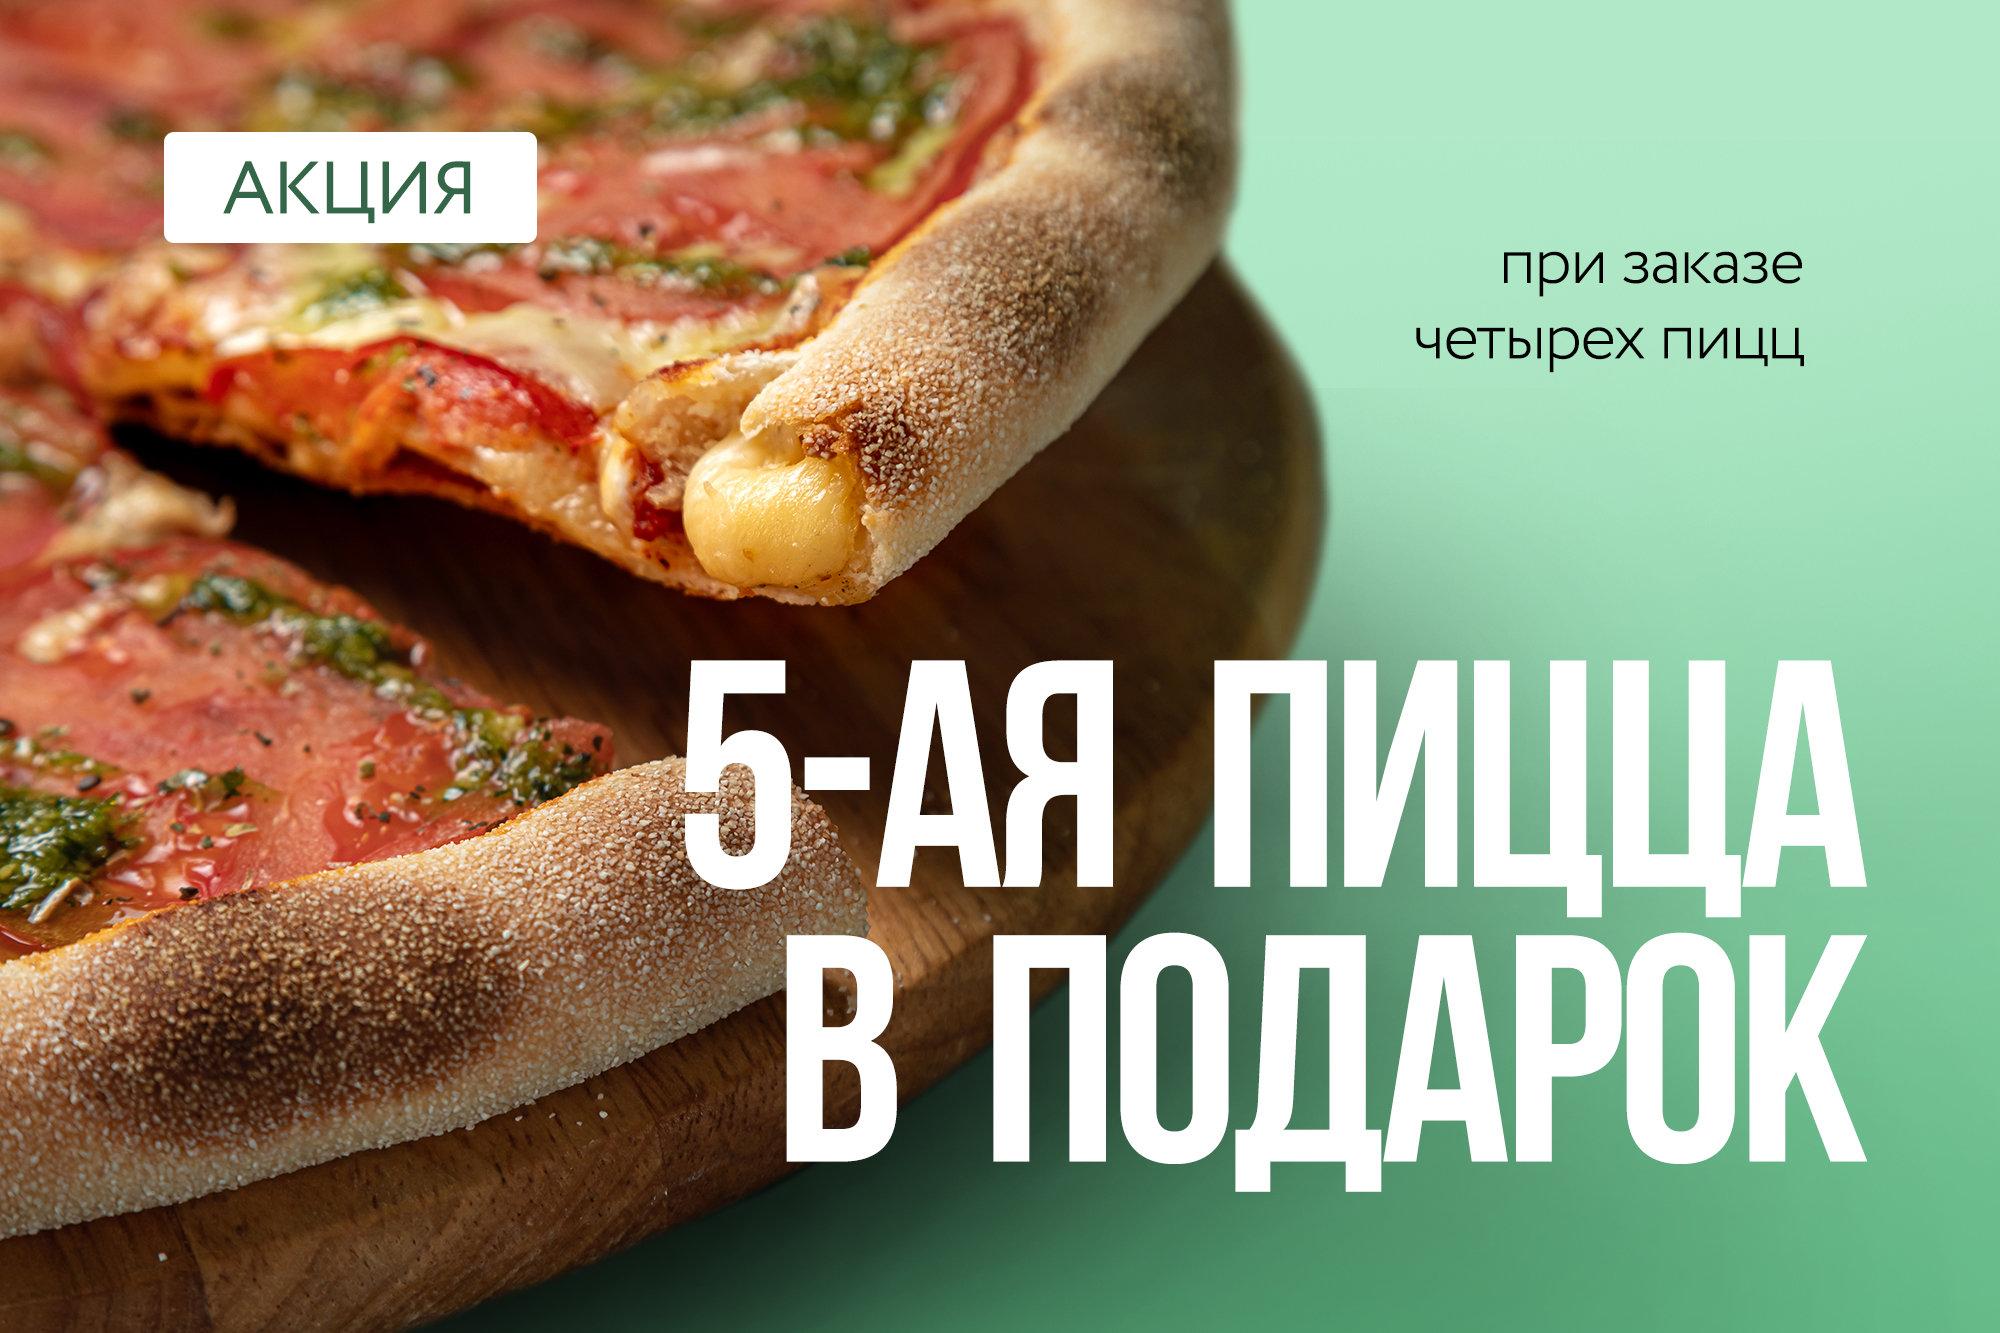 При заказе 4-х пицц, 5-я пицца в подарок